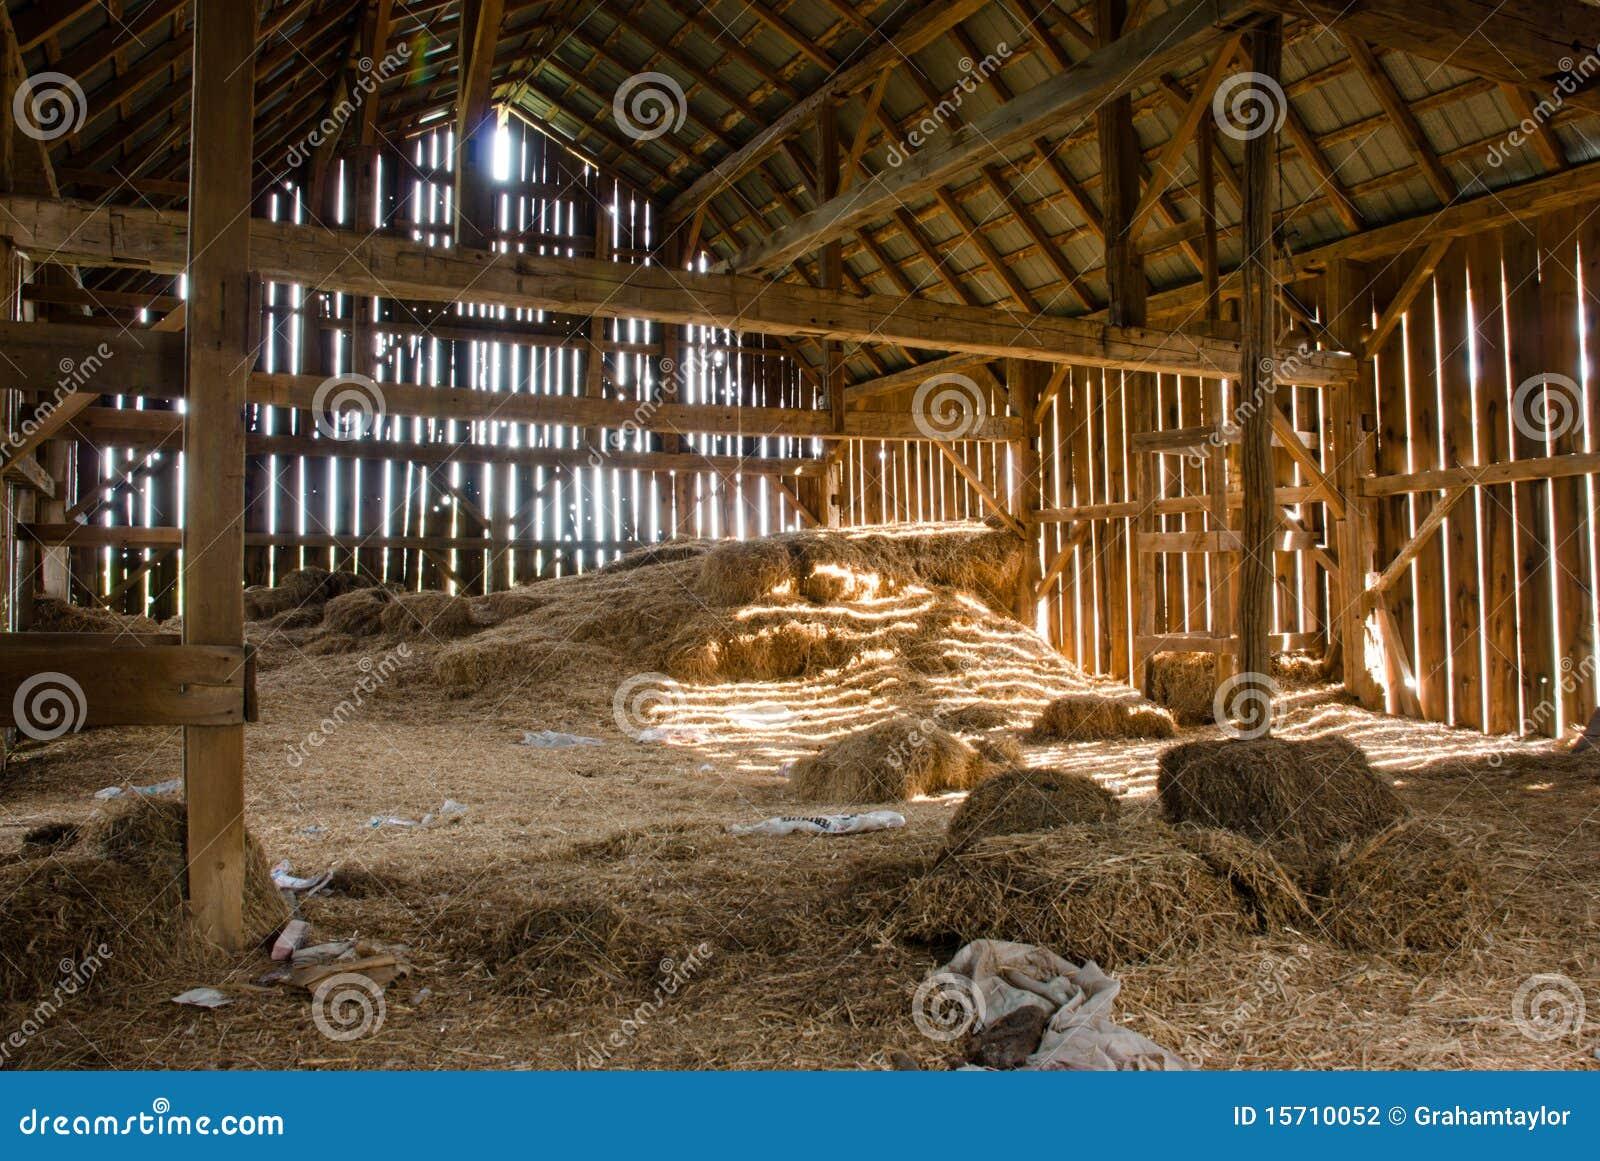 Old Barn Full Of Hay Stock Photo Image Of Rickety Door